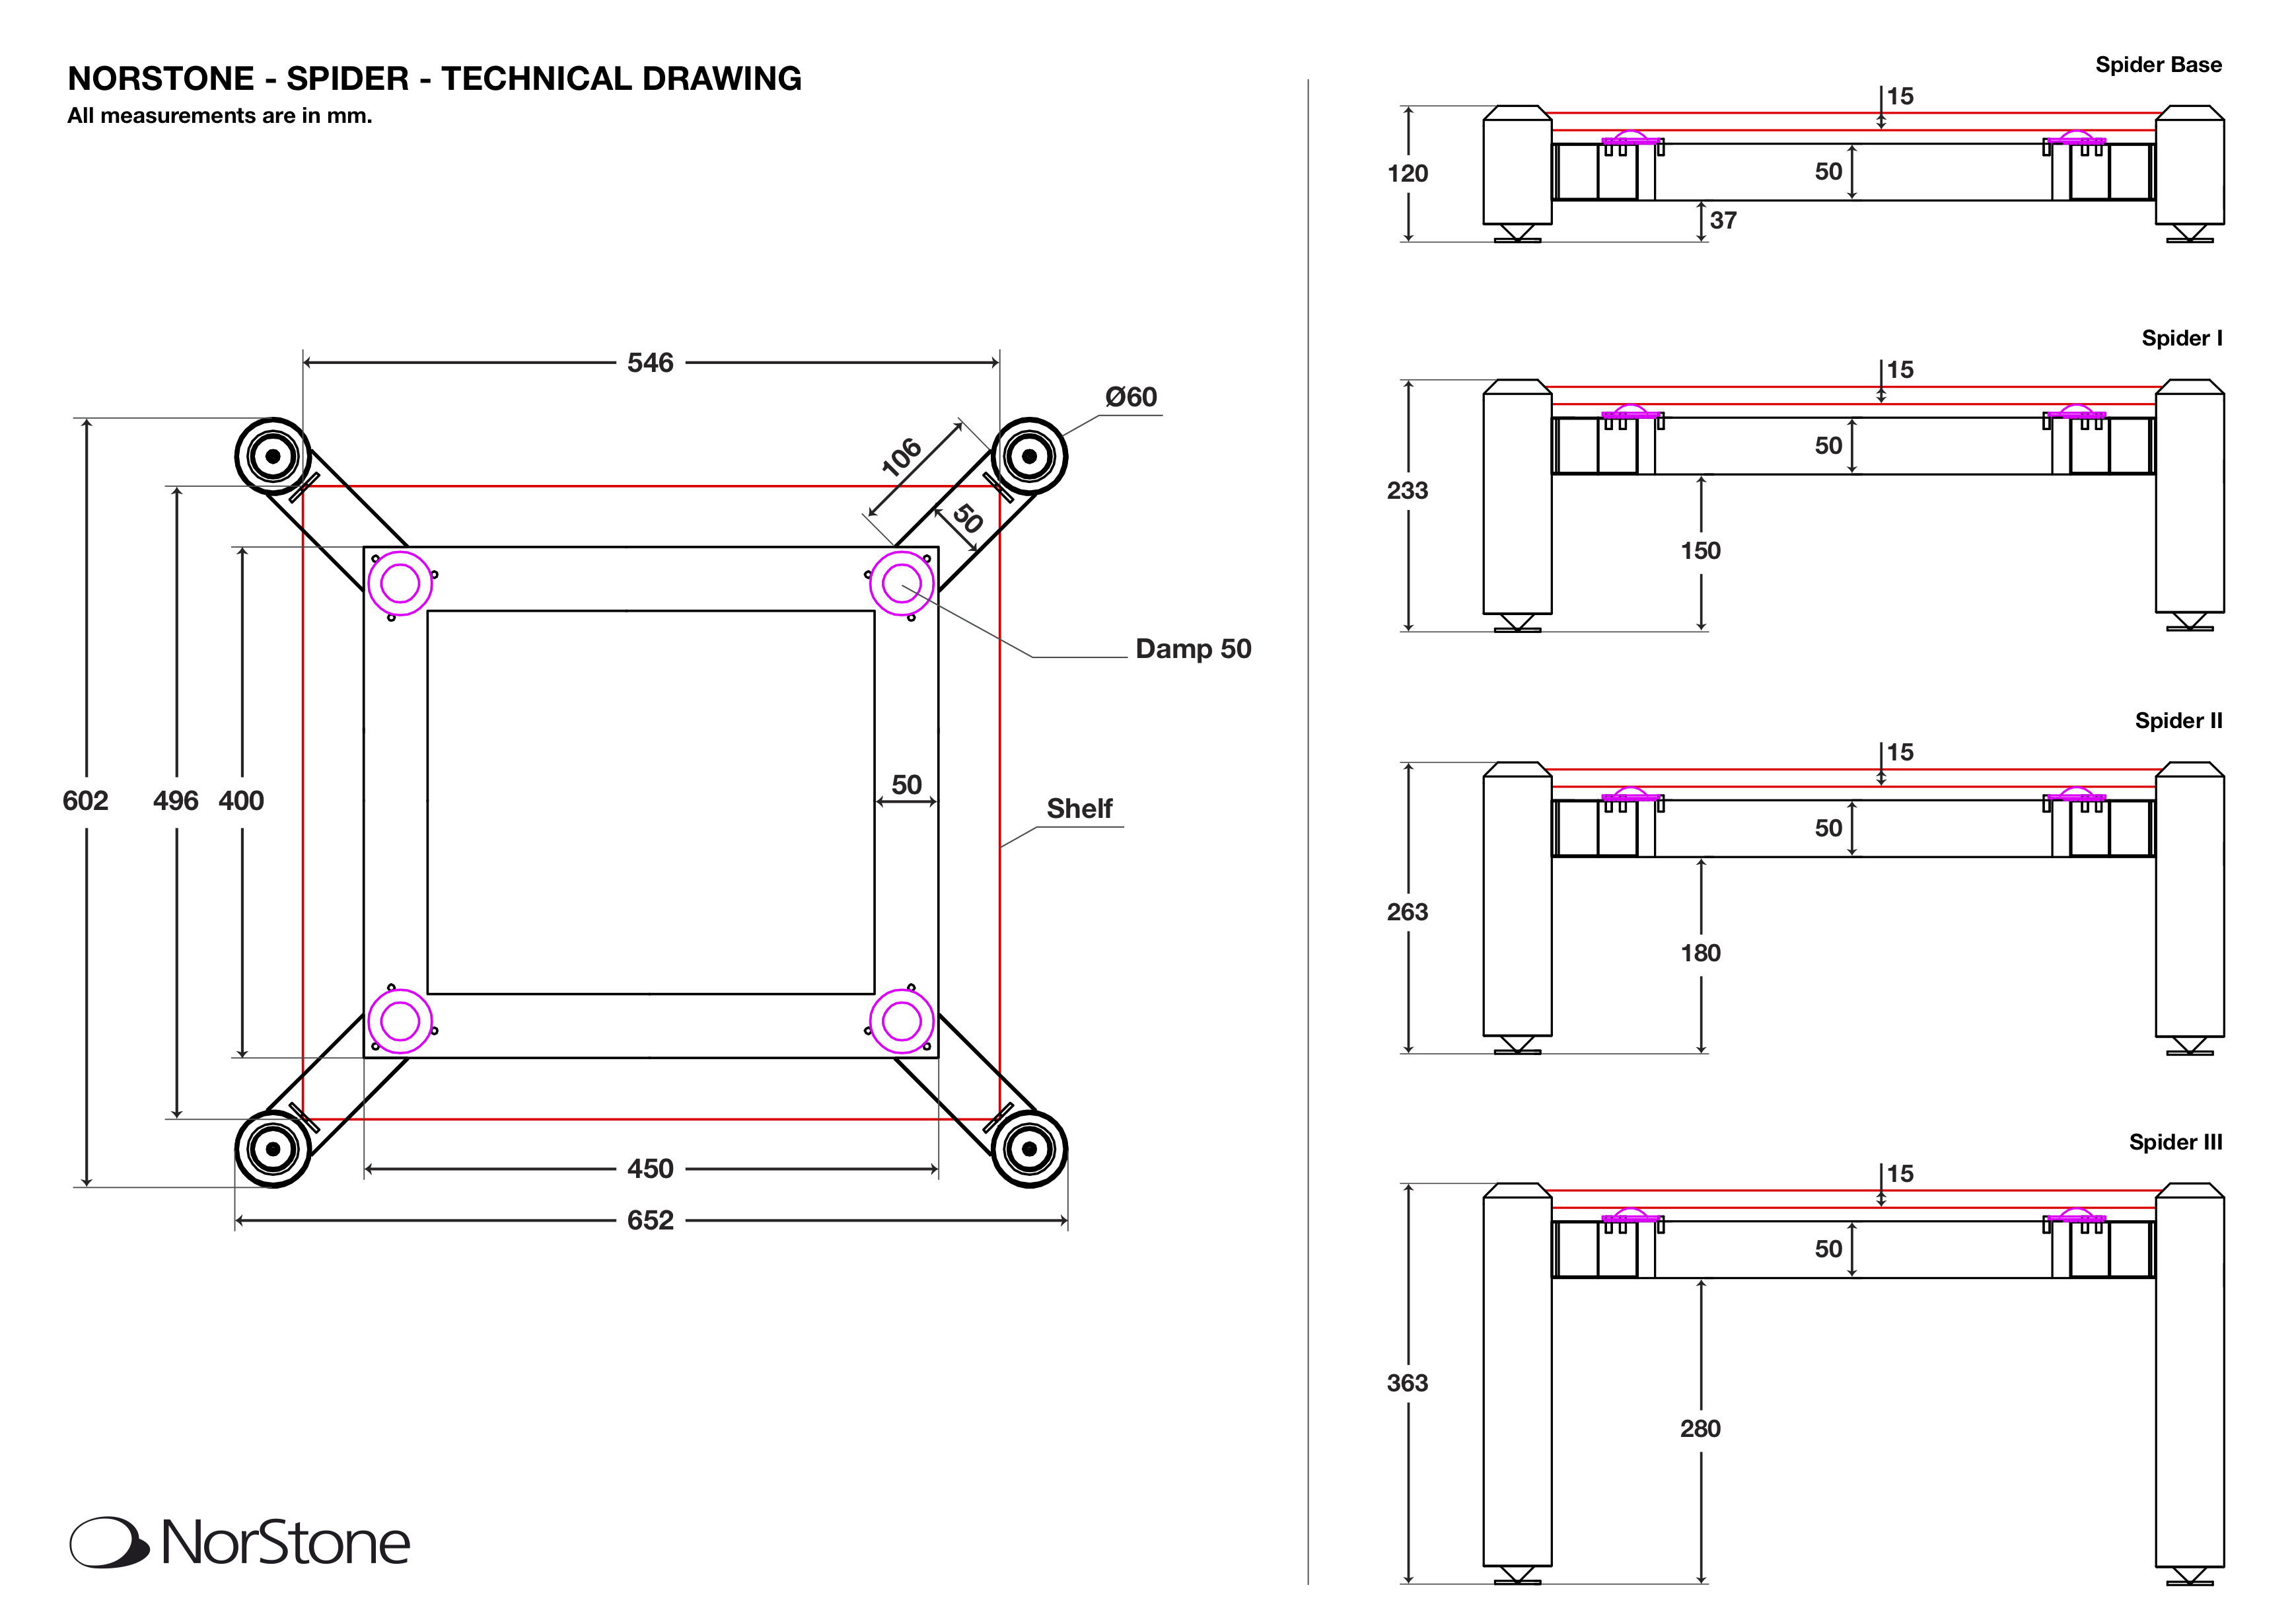 NorStone Spider Measurements